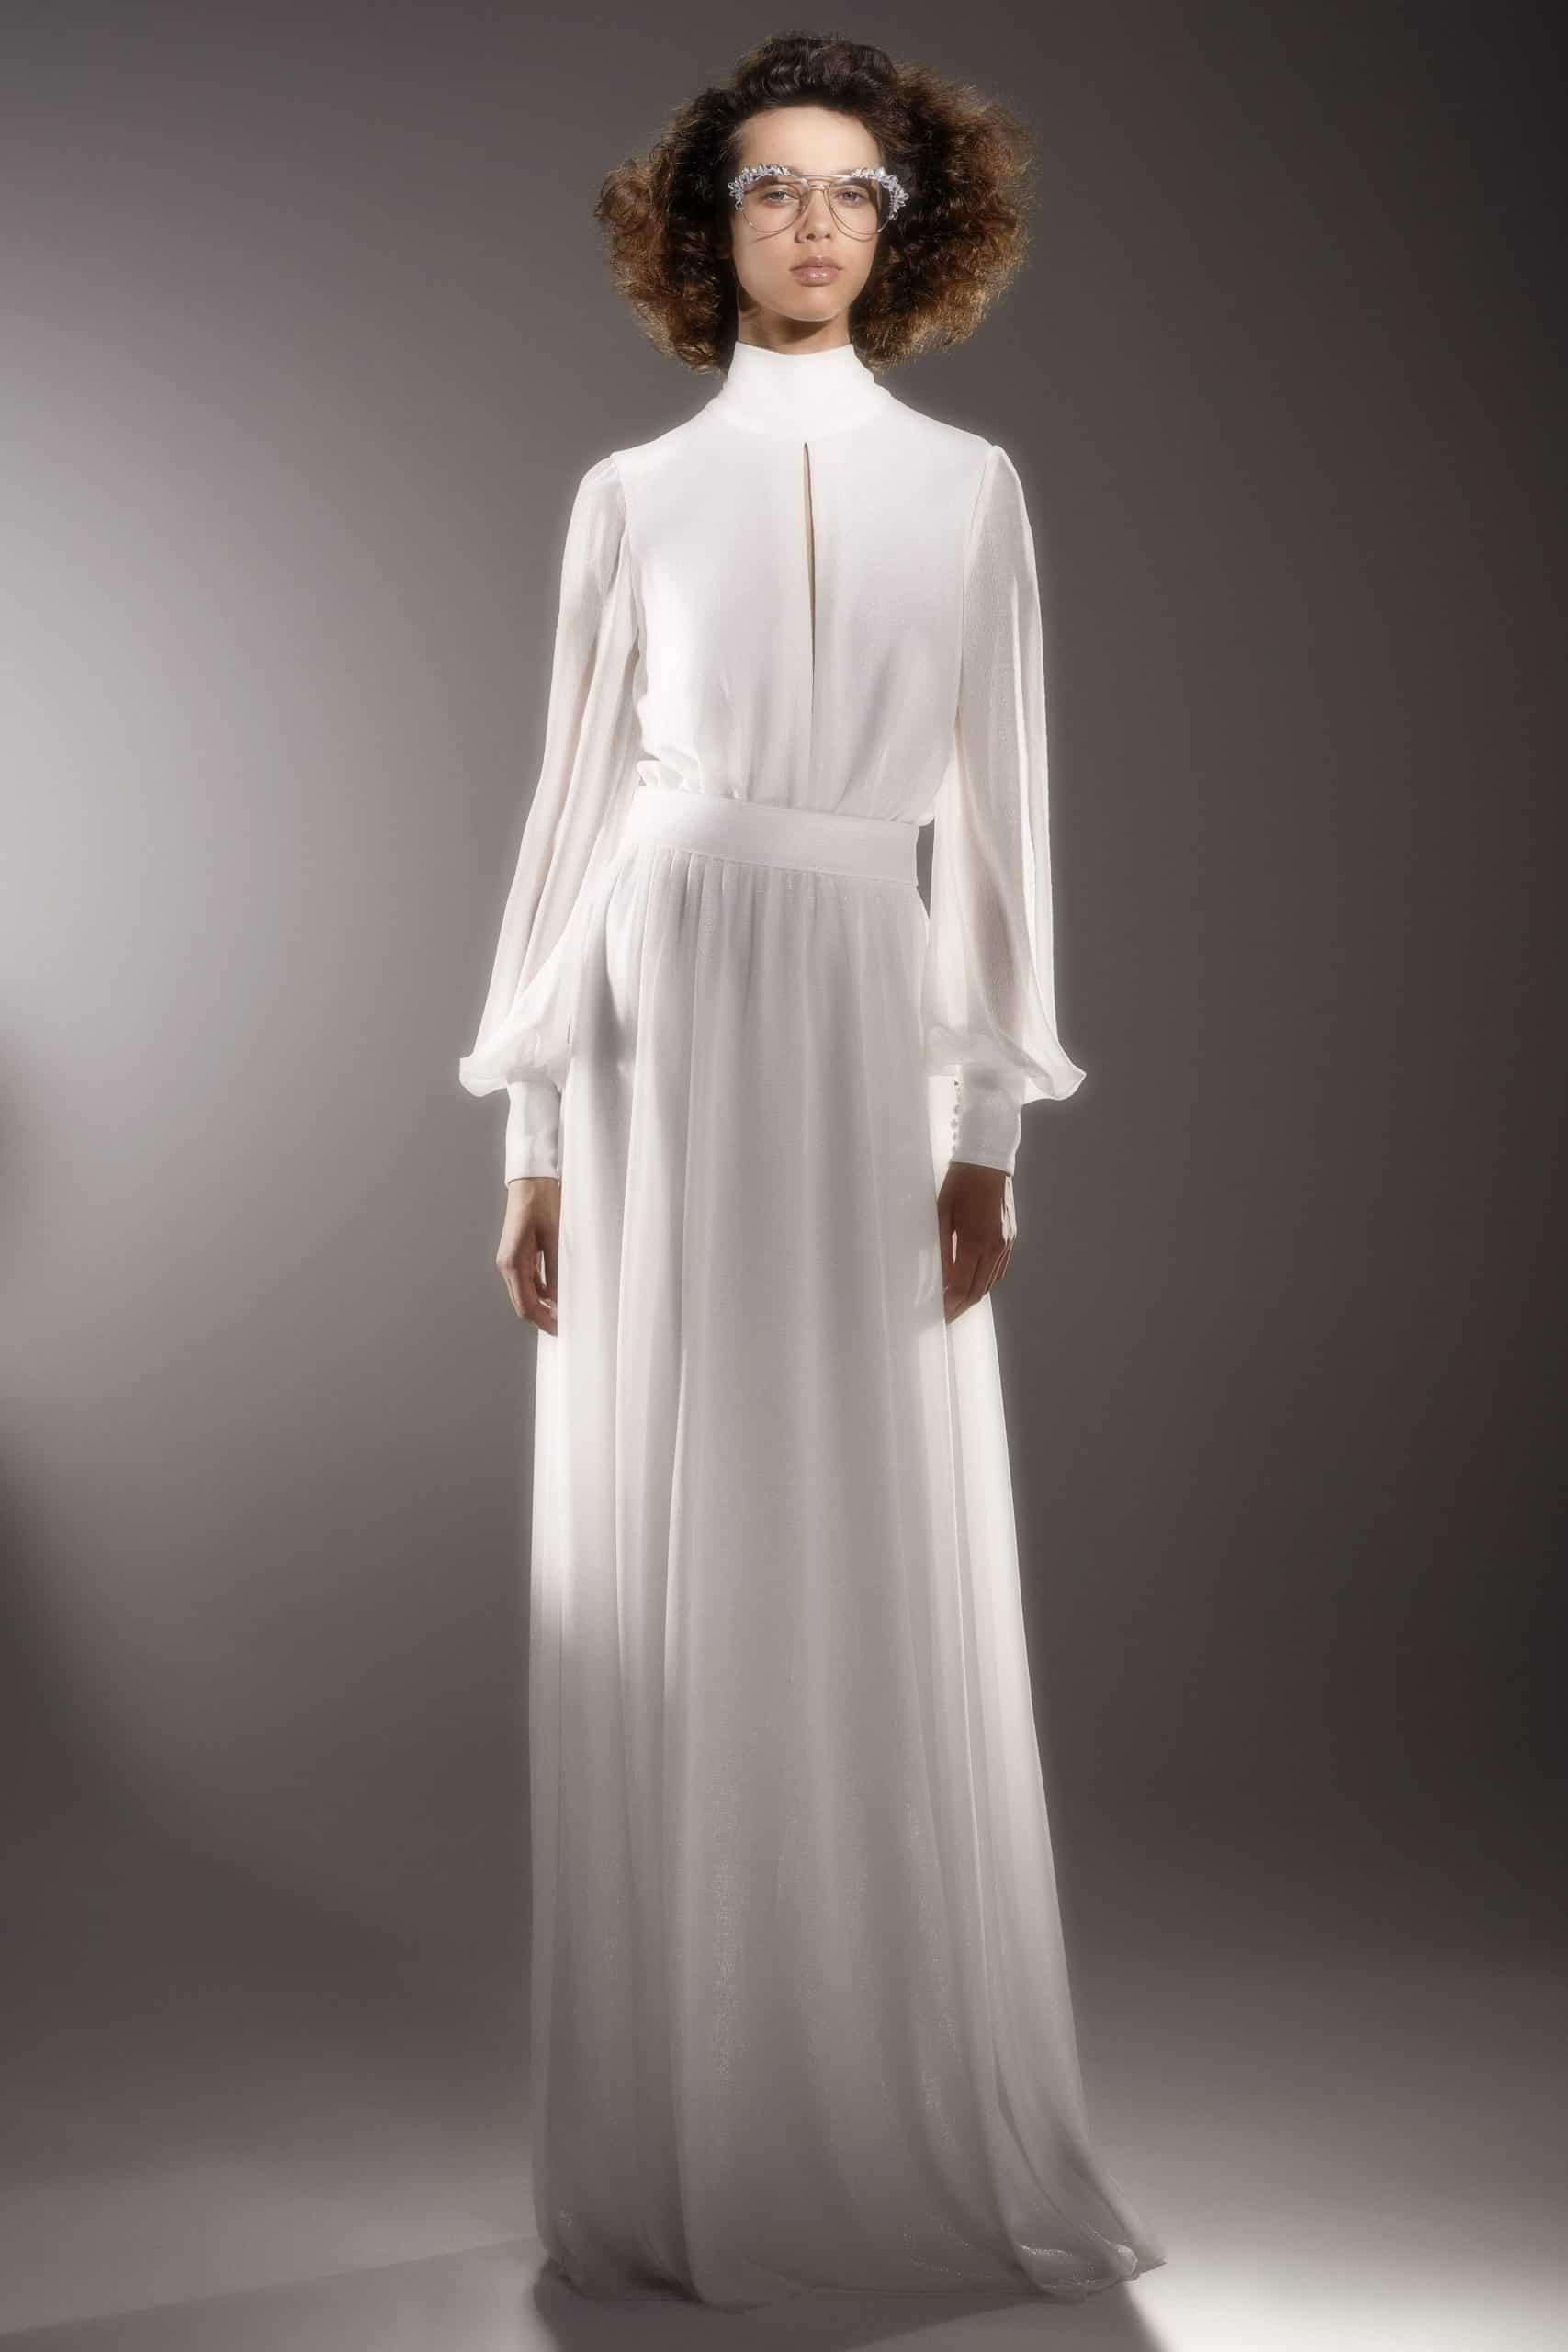 silk wedding dress by Viktor and Rolf